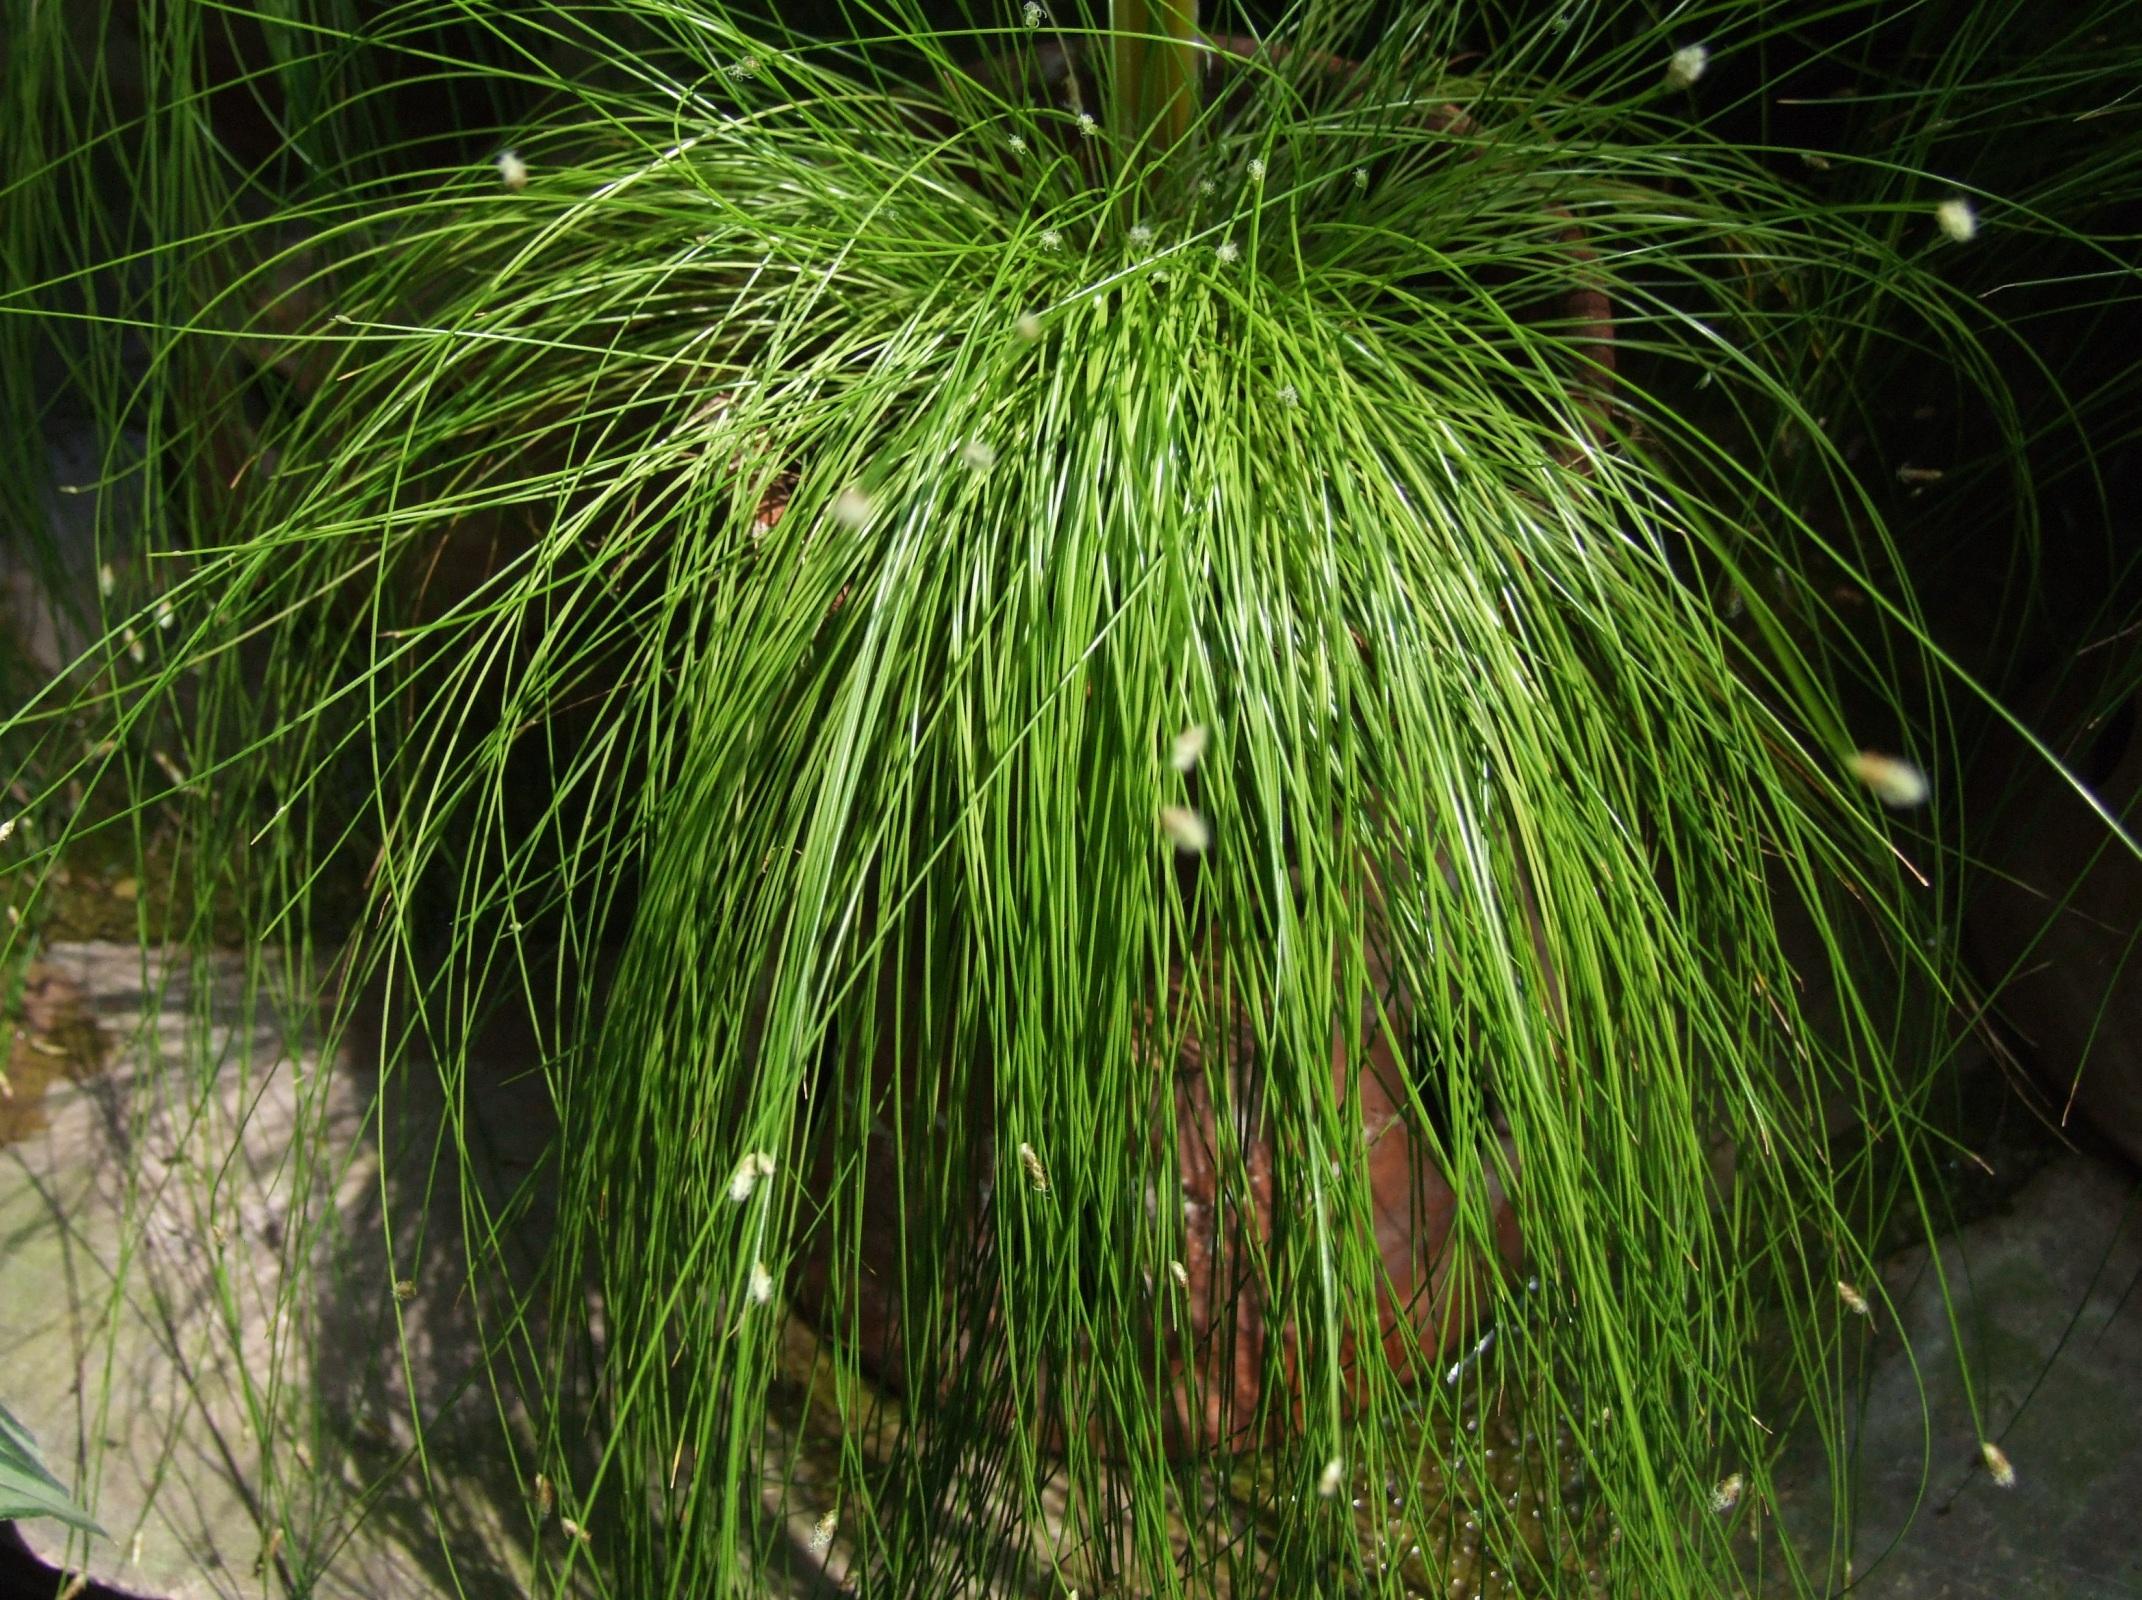 Pianta da interno sempreverde : File:Isolepis cernua OB.jpg